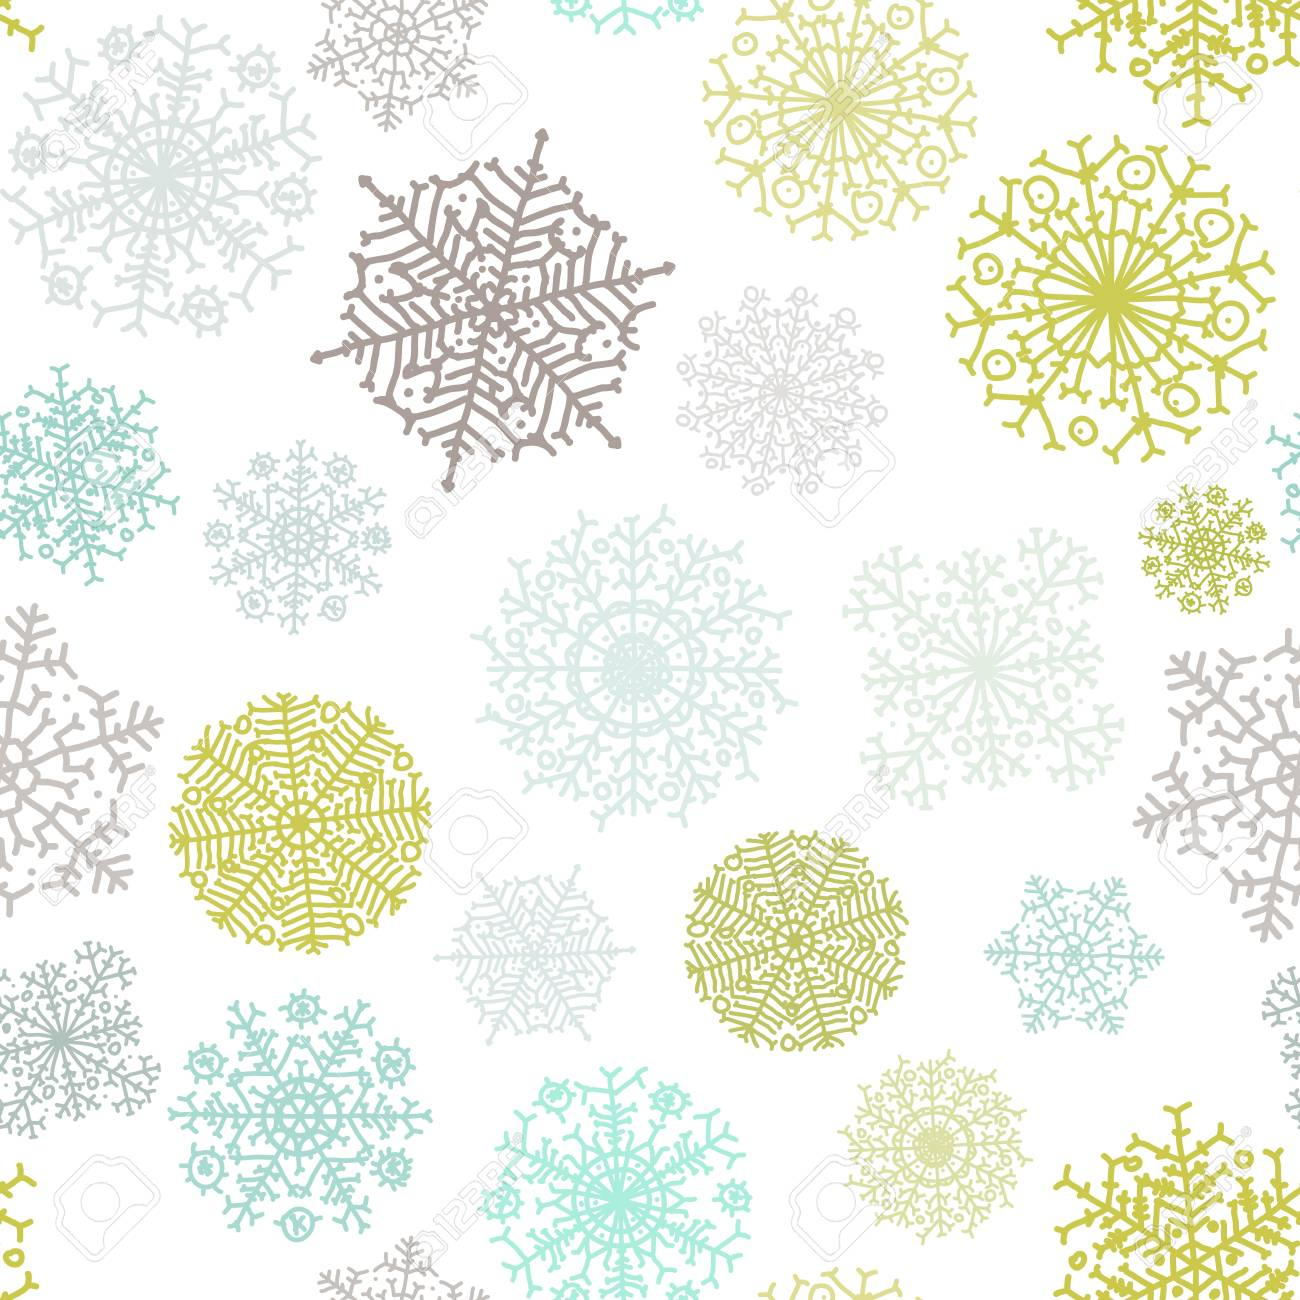 Ornate snowflake seamless background    EPS8 Stock Vector - 17525409